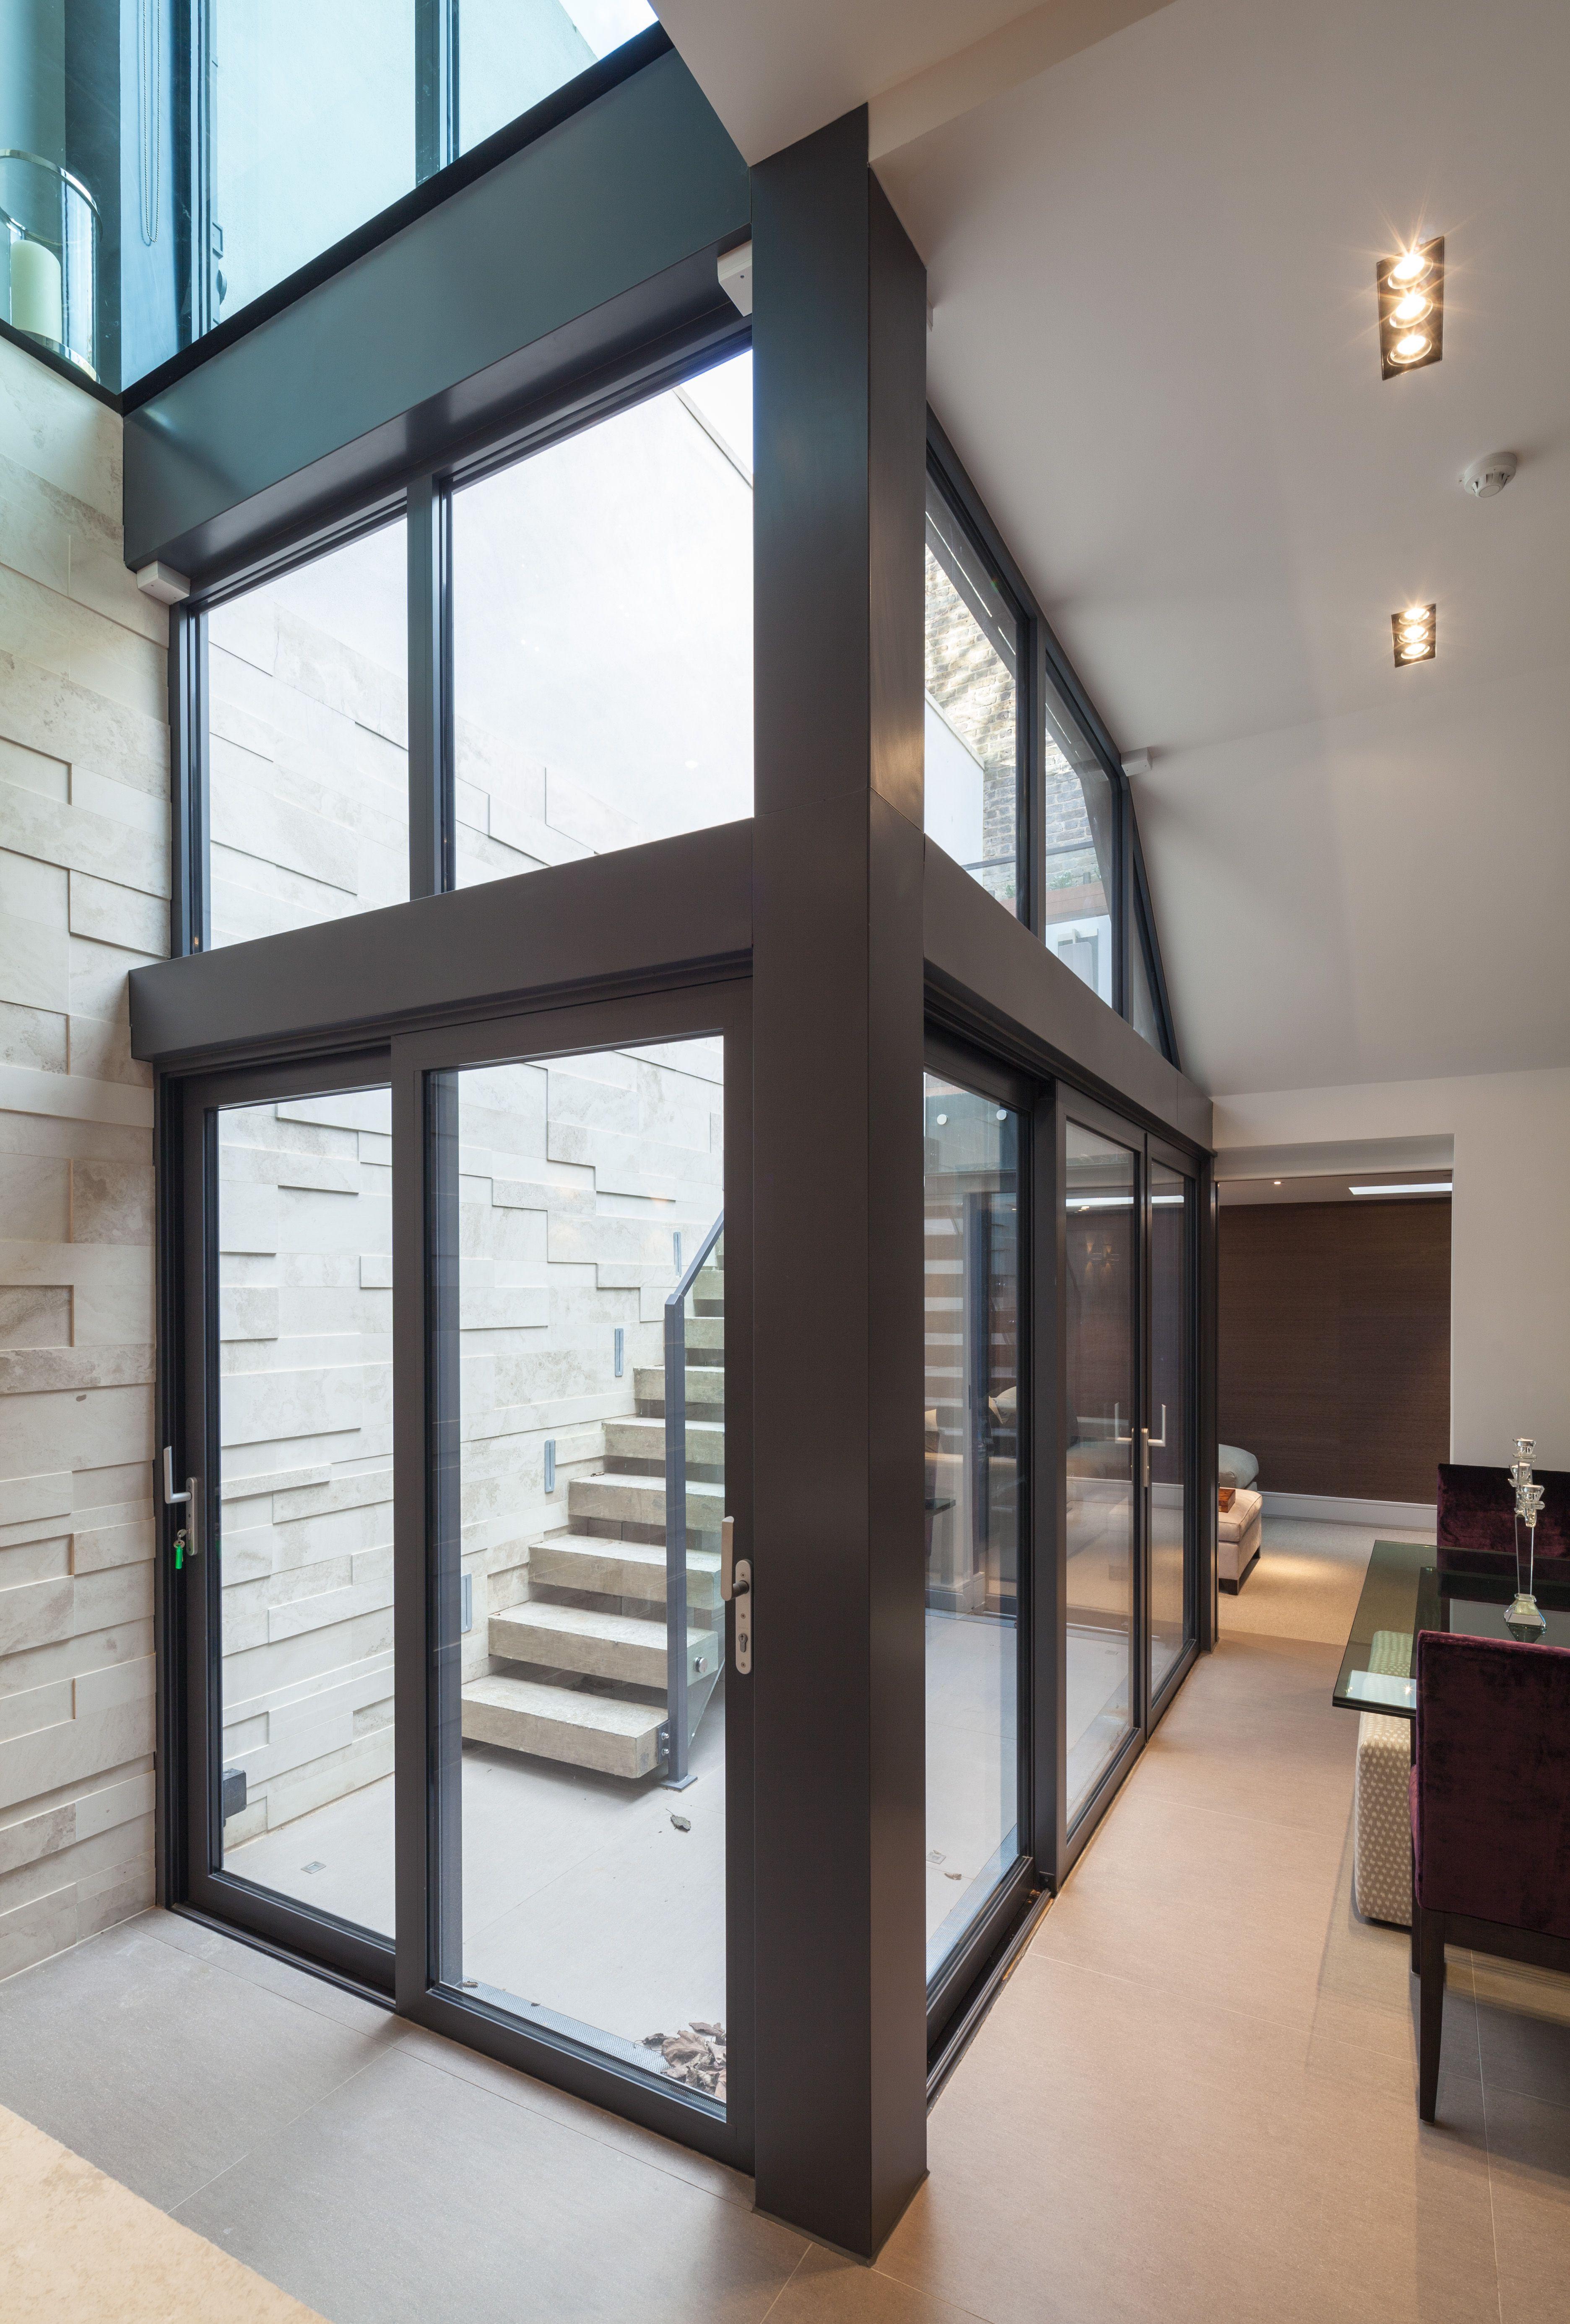 Interiors Lightwell Basement Smith Terrace Chelsea PEEK Architecture Design Peekarchitecture